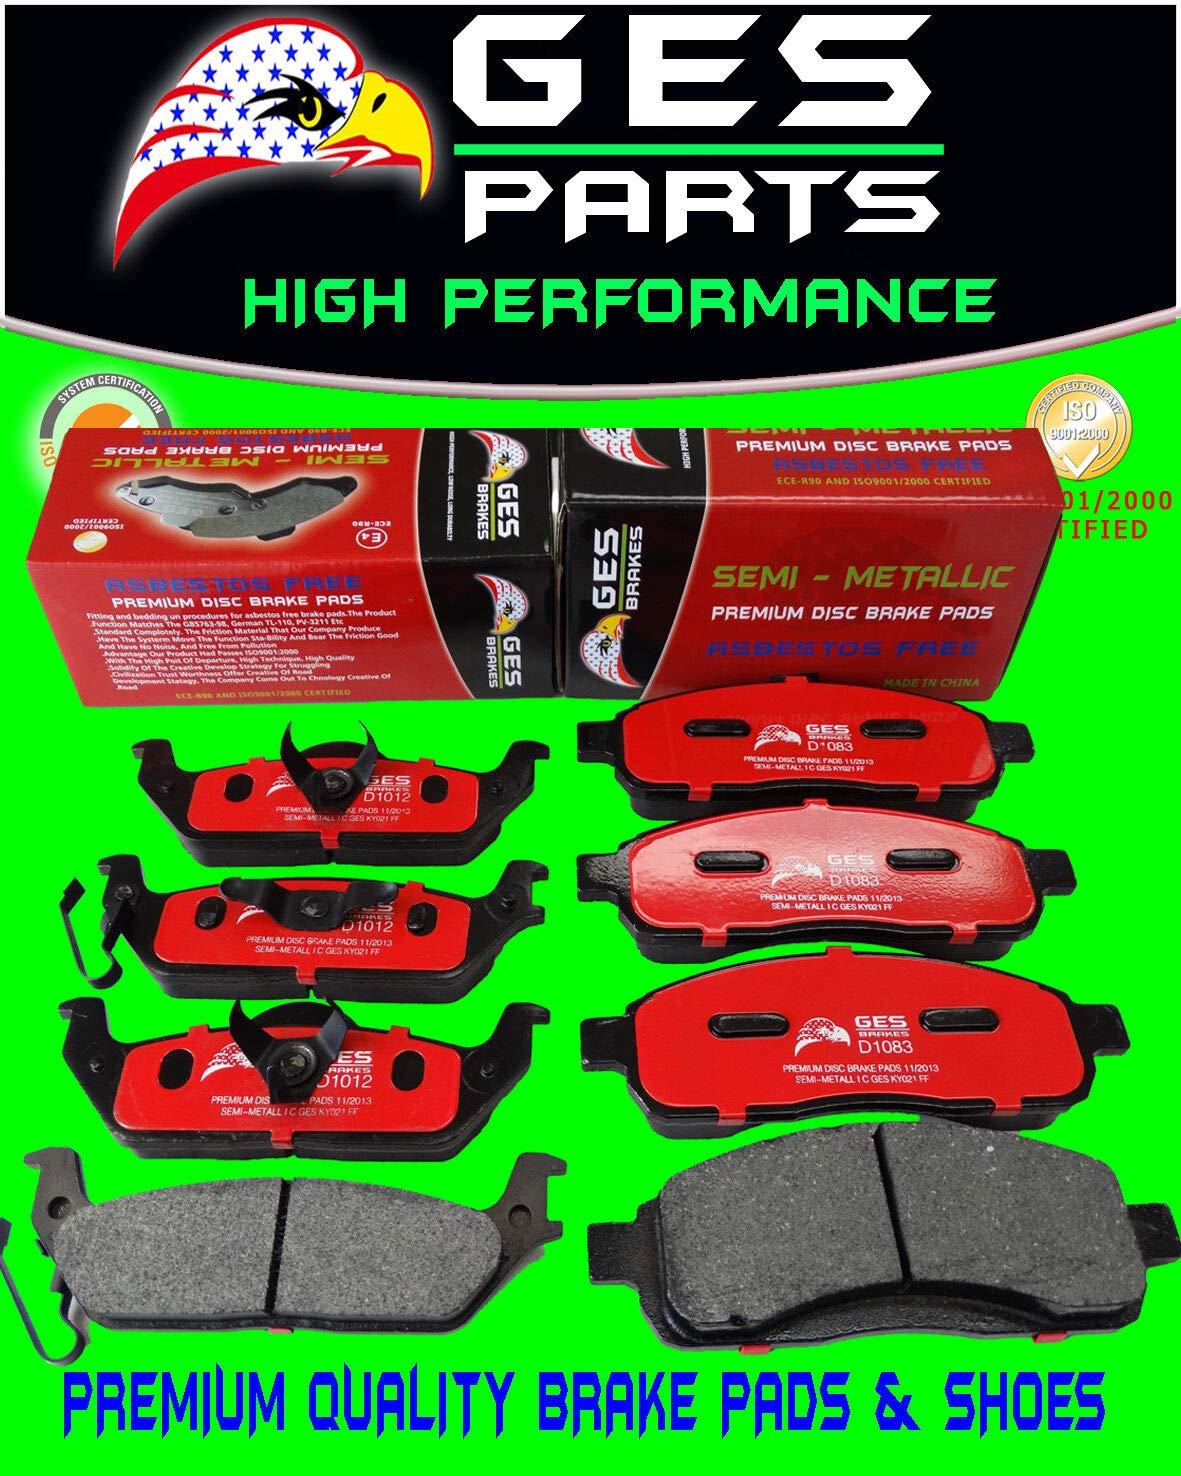 GES PARTS 2 Sets 04-08 Fits Ford F150 Front & Rear Premium Quality Brake Pads D1083 / D1012 by GES PARTS